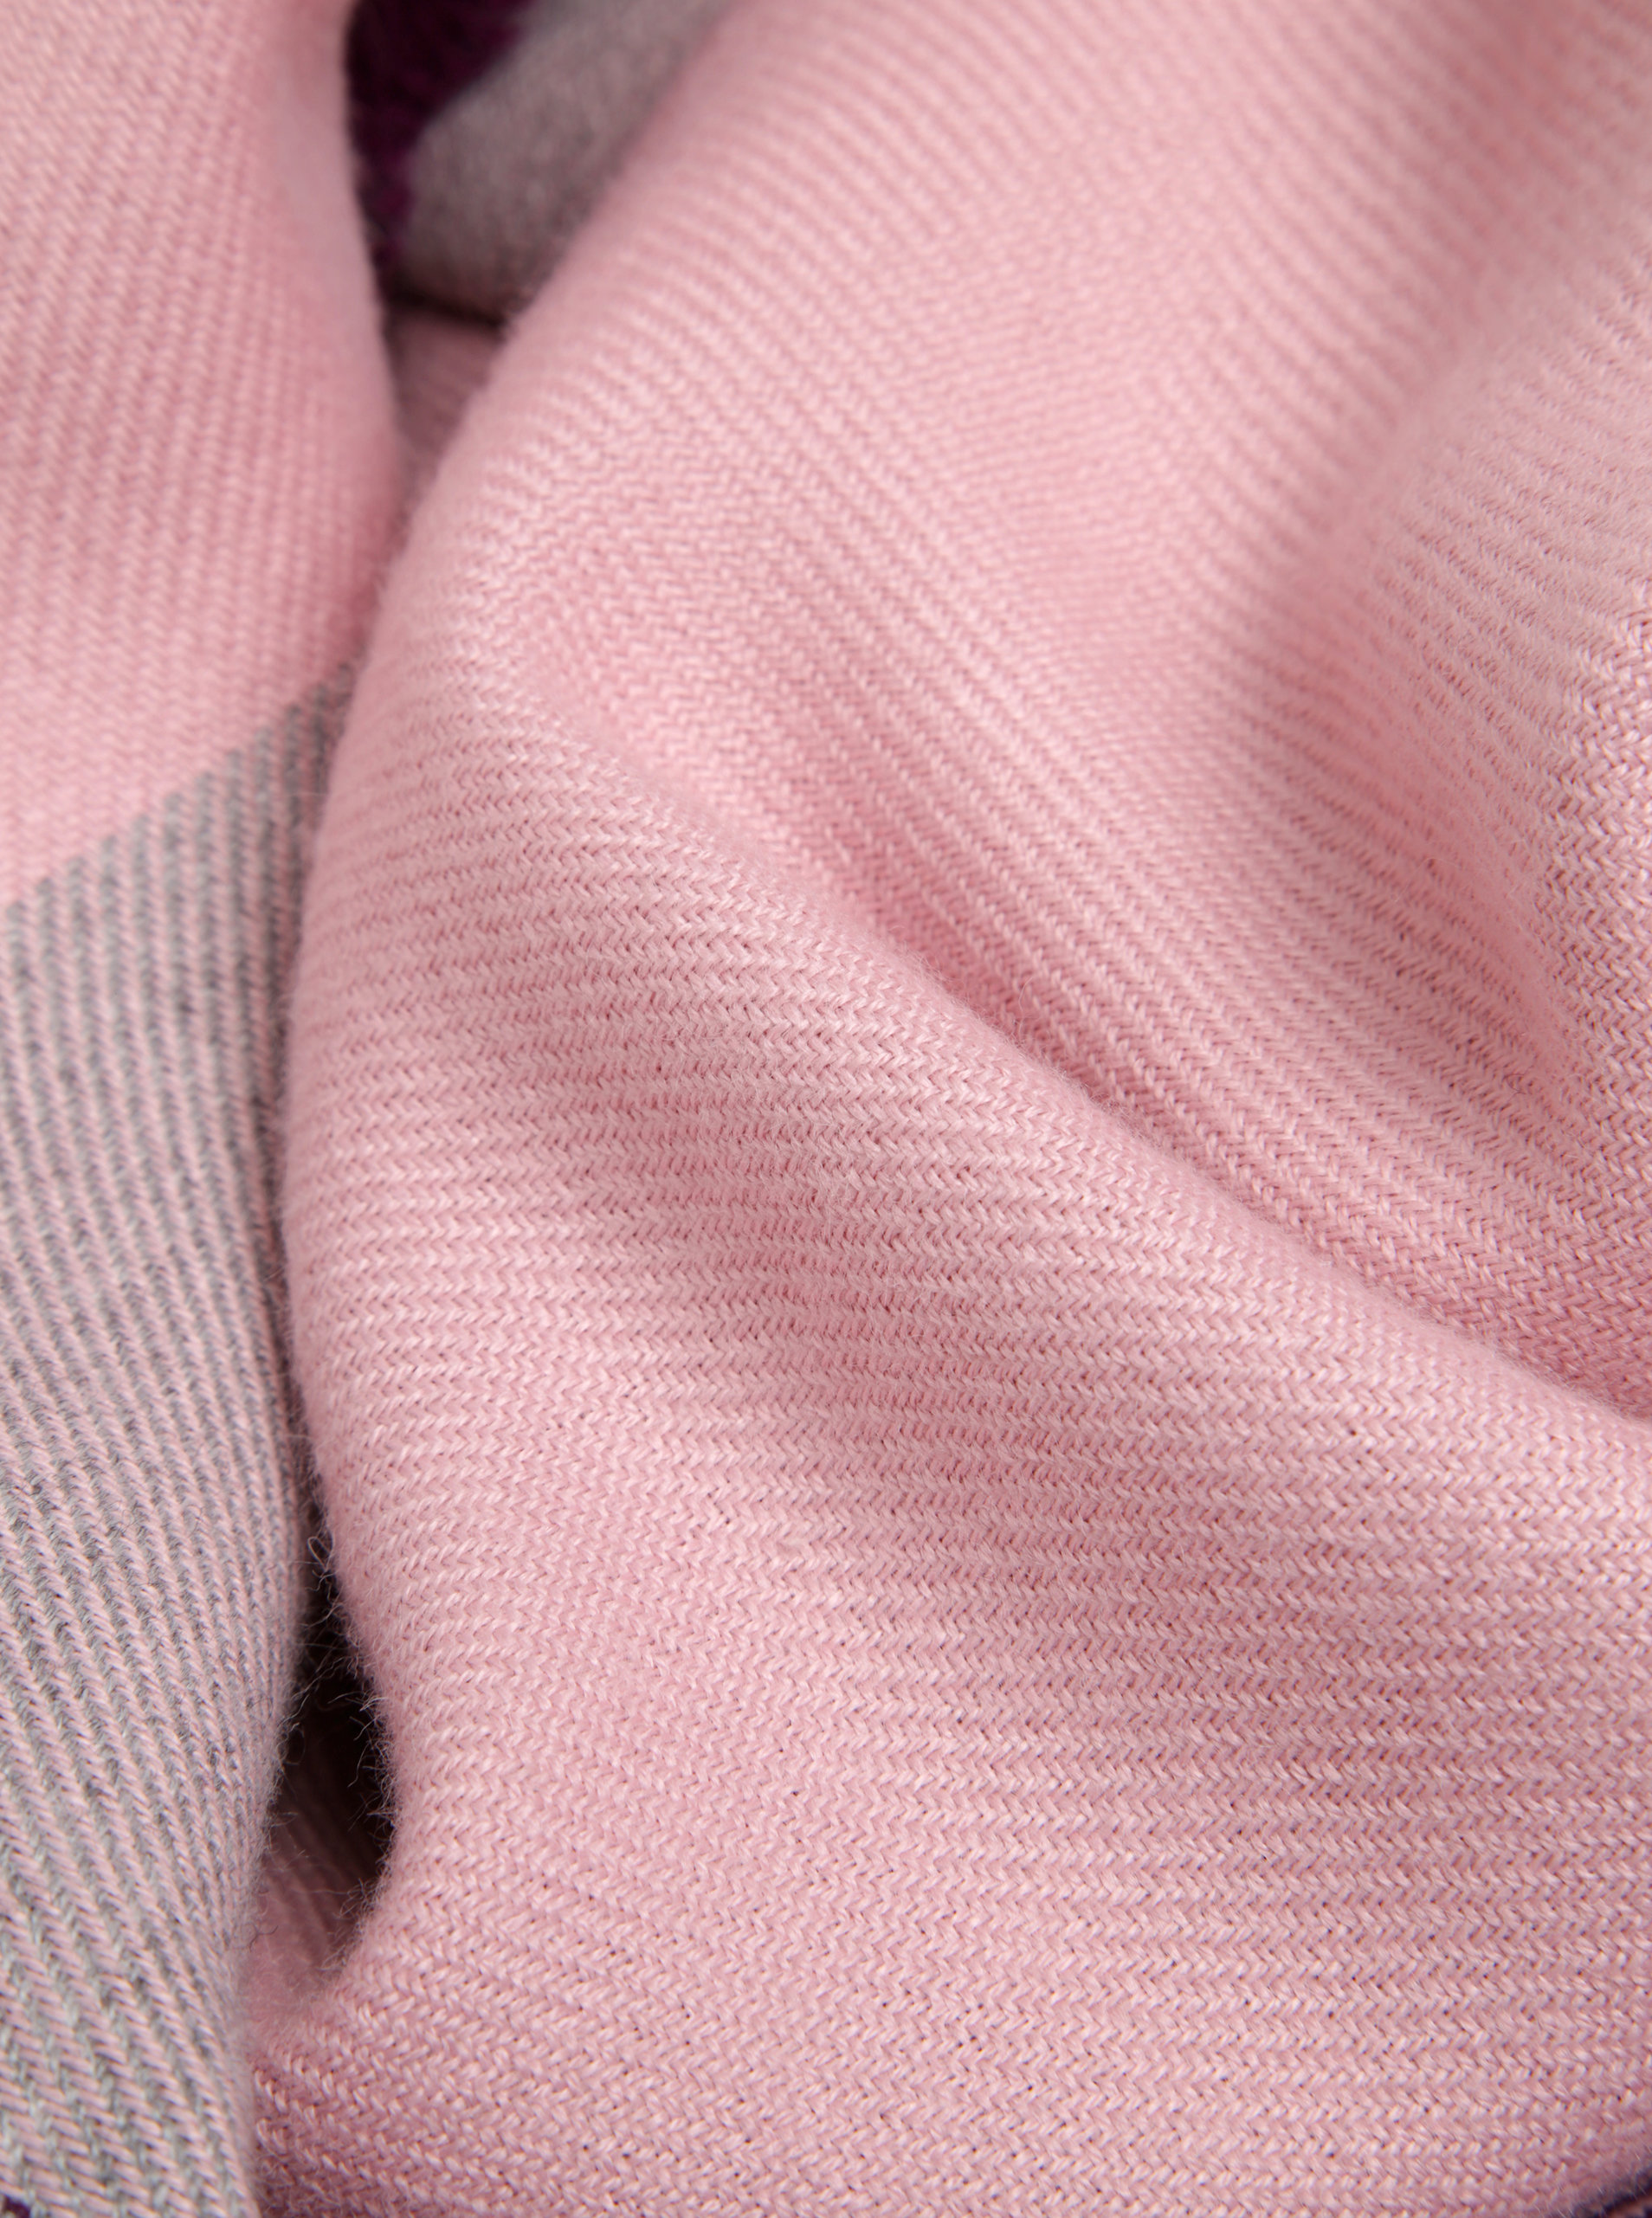 f529f043f Sivo-ružový dámsky šál s prímesou vlny Tommy Hilfiger Blanket | ZOOT.sk